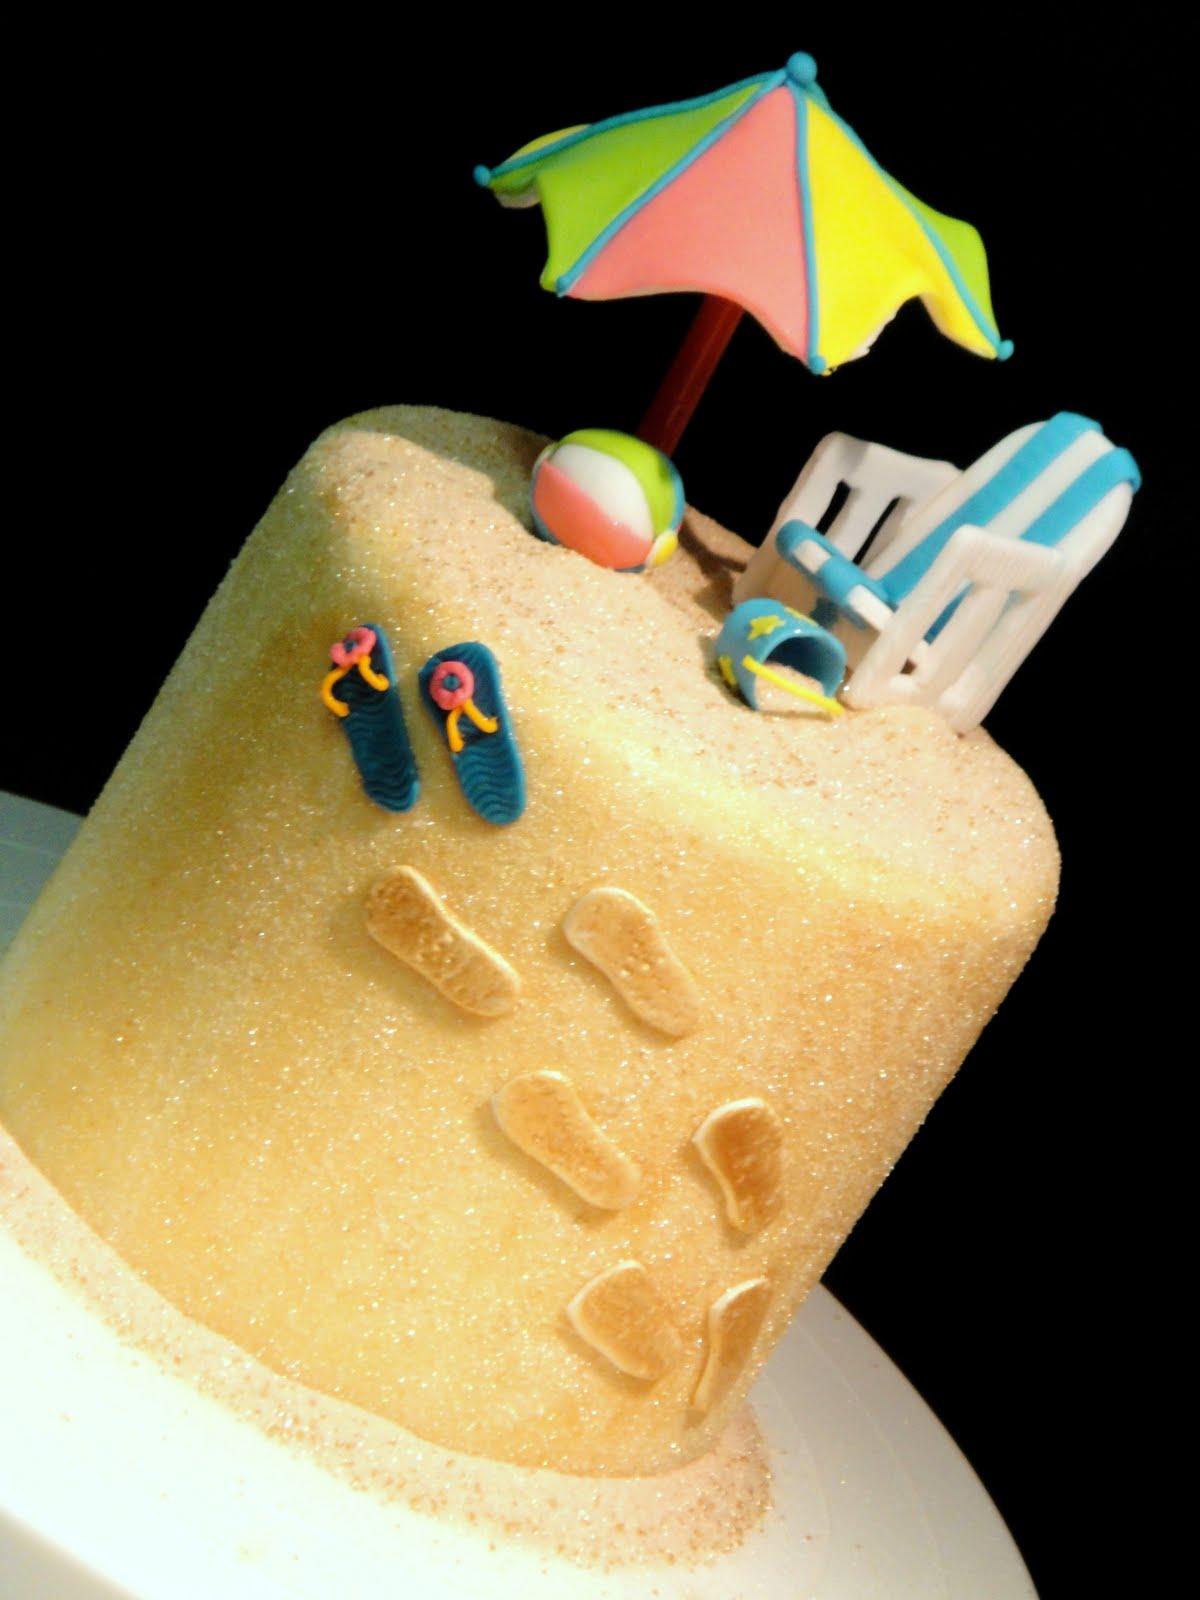 Cake Decorating Making Sand : ~ Sugar Teachers ~ Cake Decorating and Sugar Art Tutorials ...